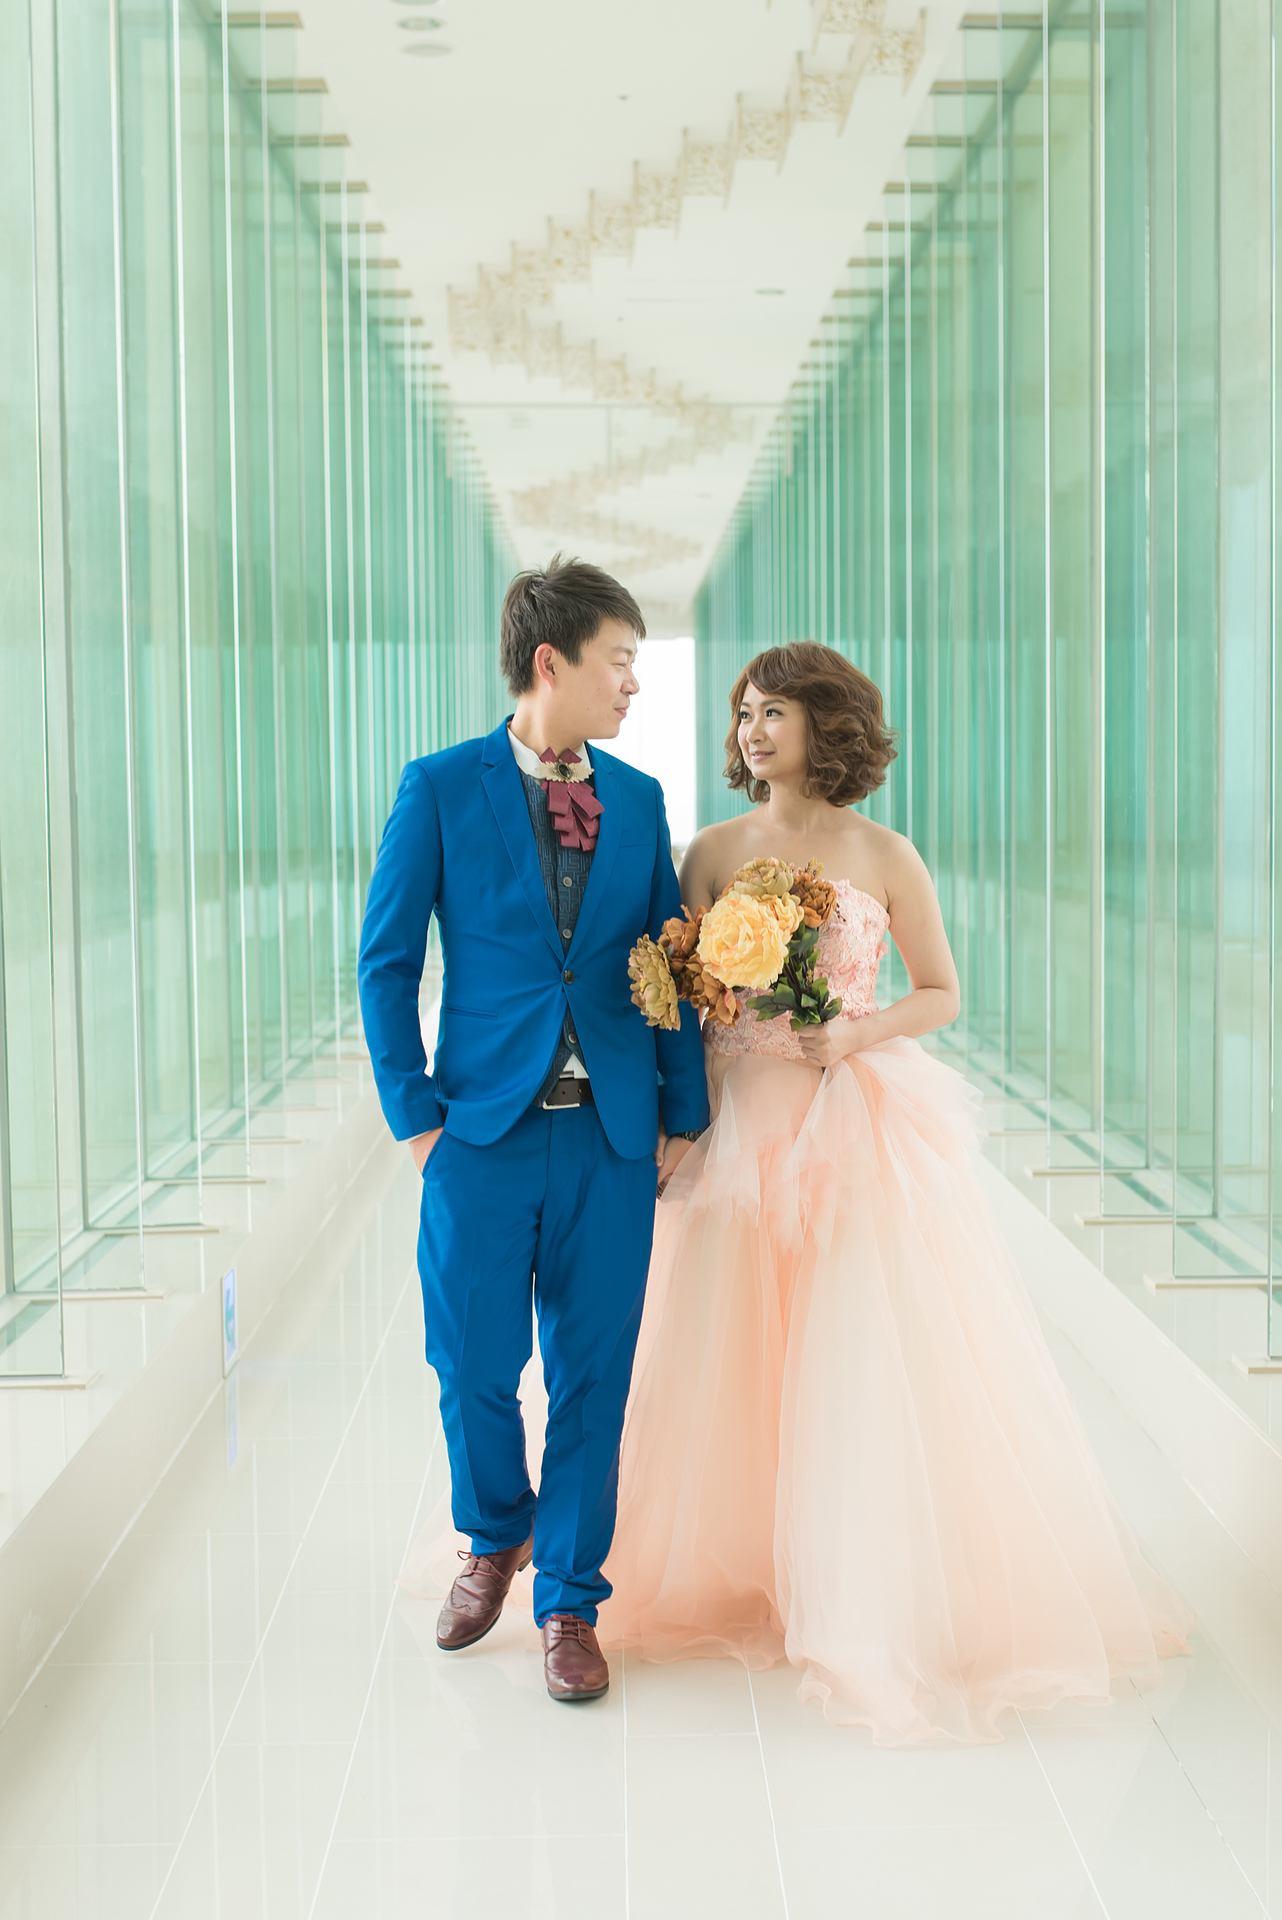 H會館婚紗